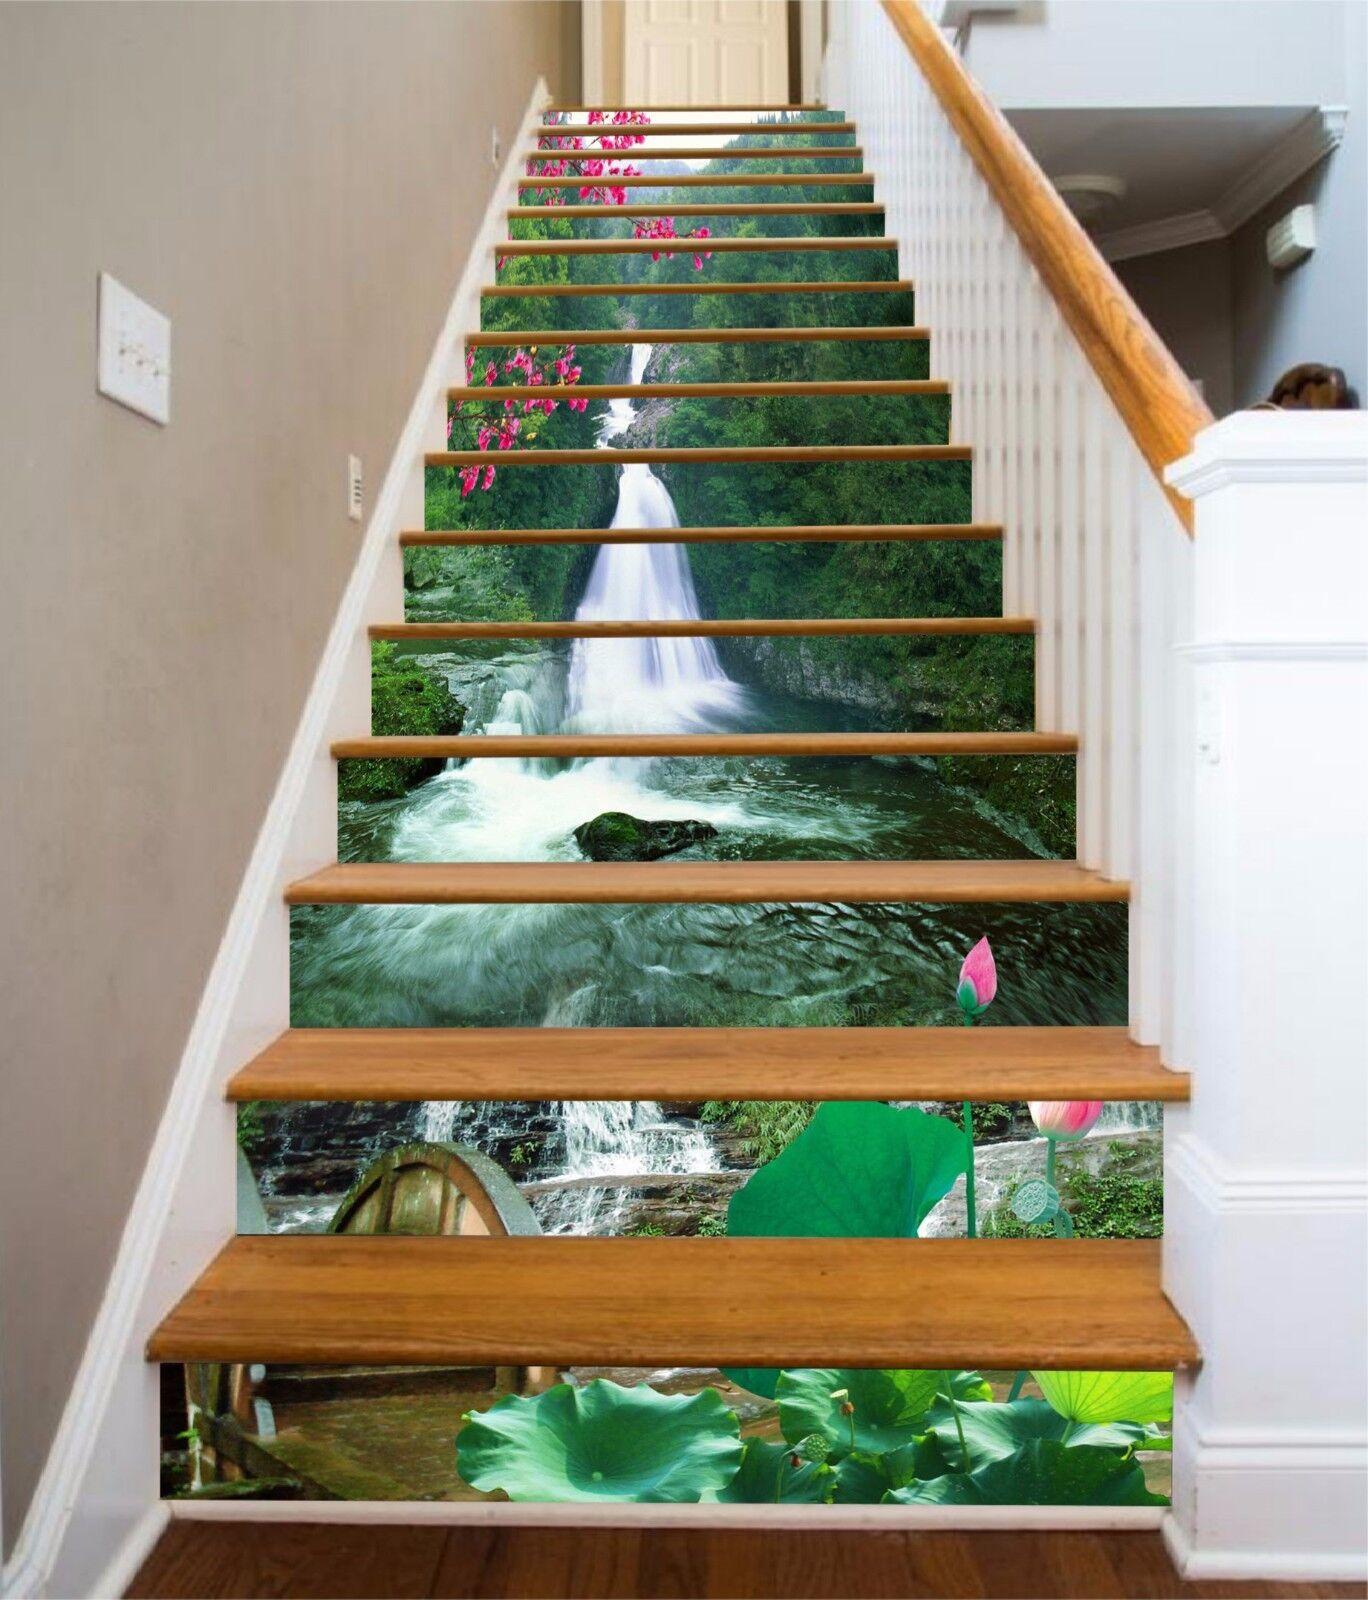 3D Long Creek 3930 Stairs Risers Decoration Photo Mural Vinyl Decal WandPapier US